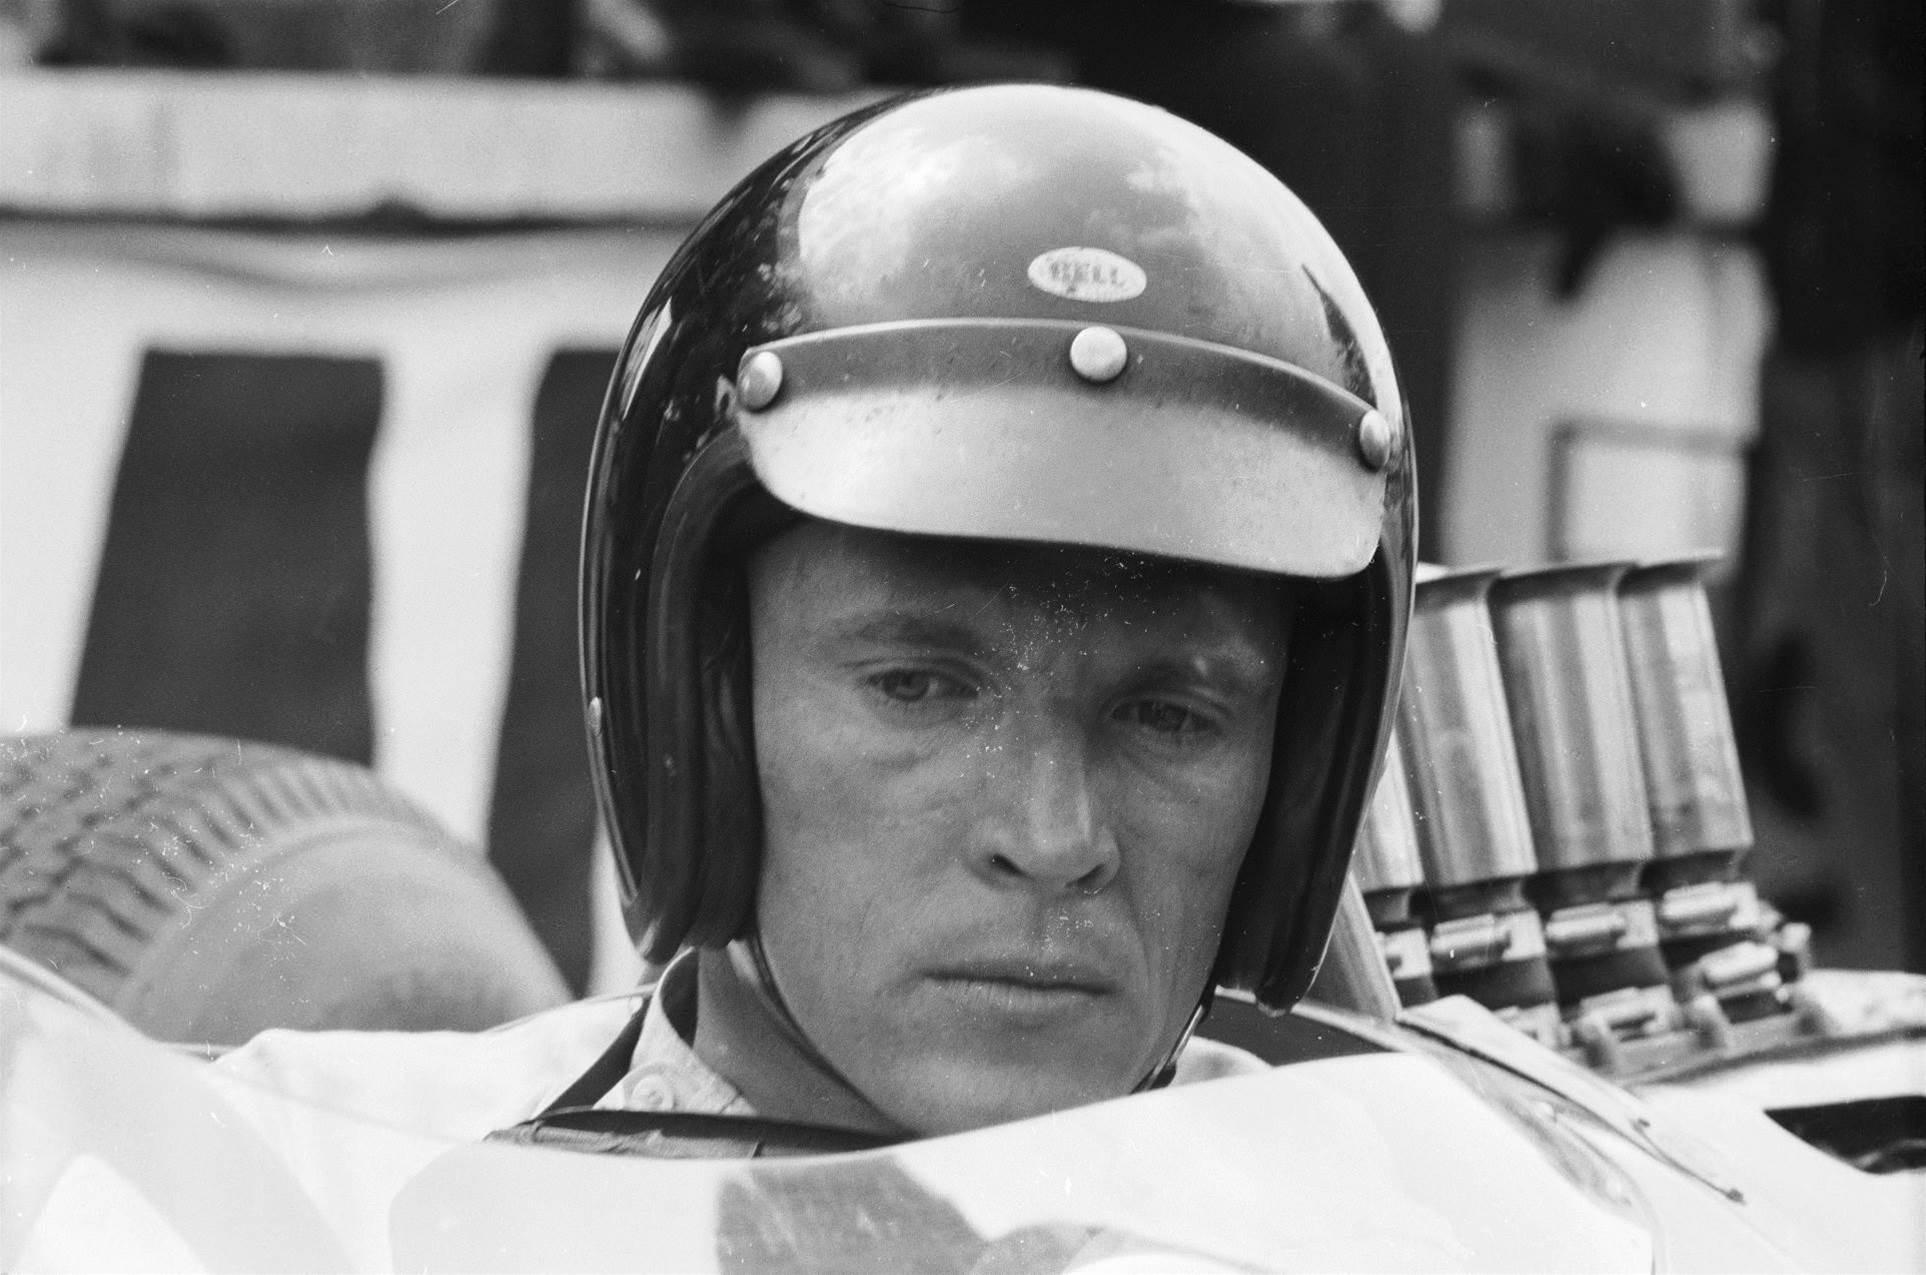 American legend Dan Gurney dies